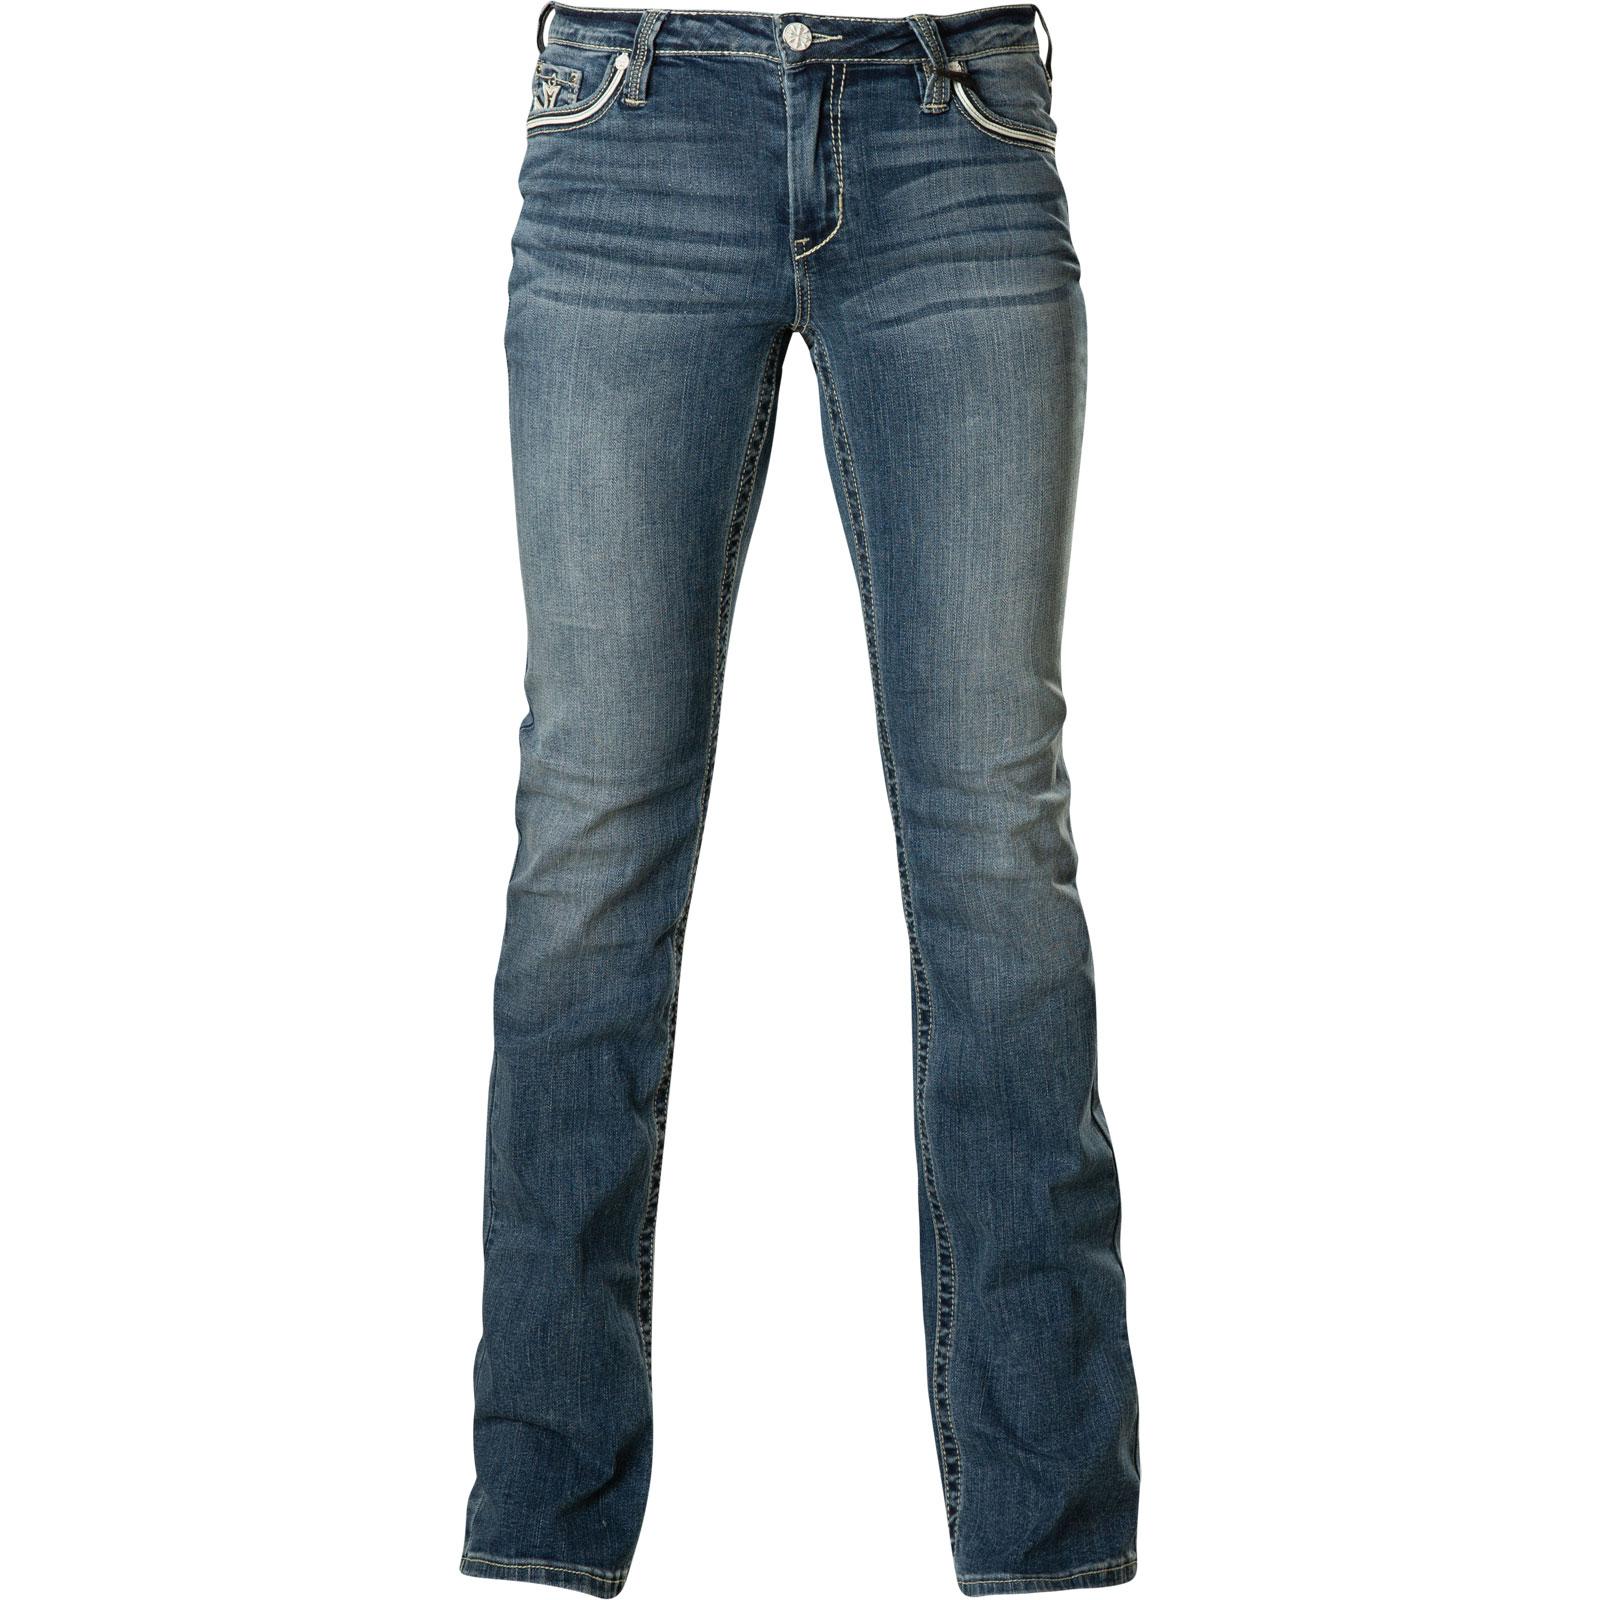 Affliction Damen Jeans Jade Standard Kenzi Blau